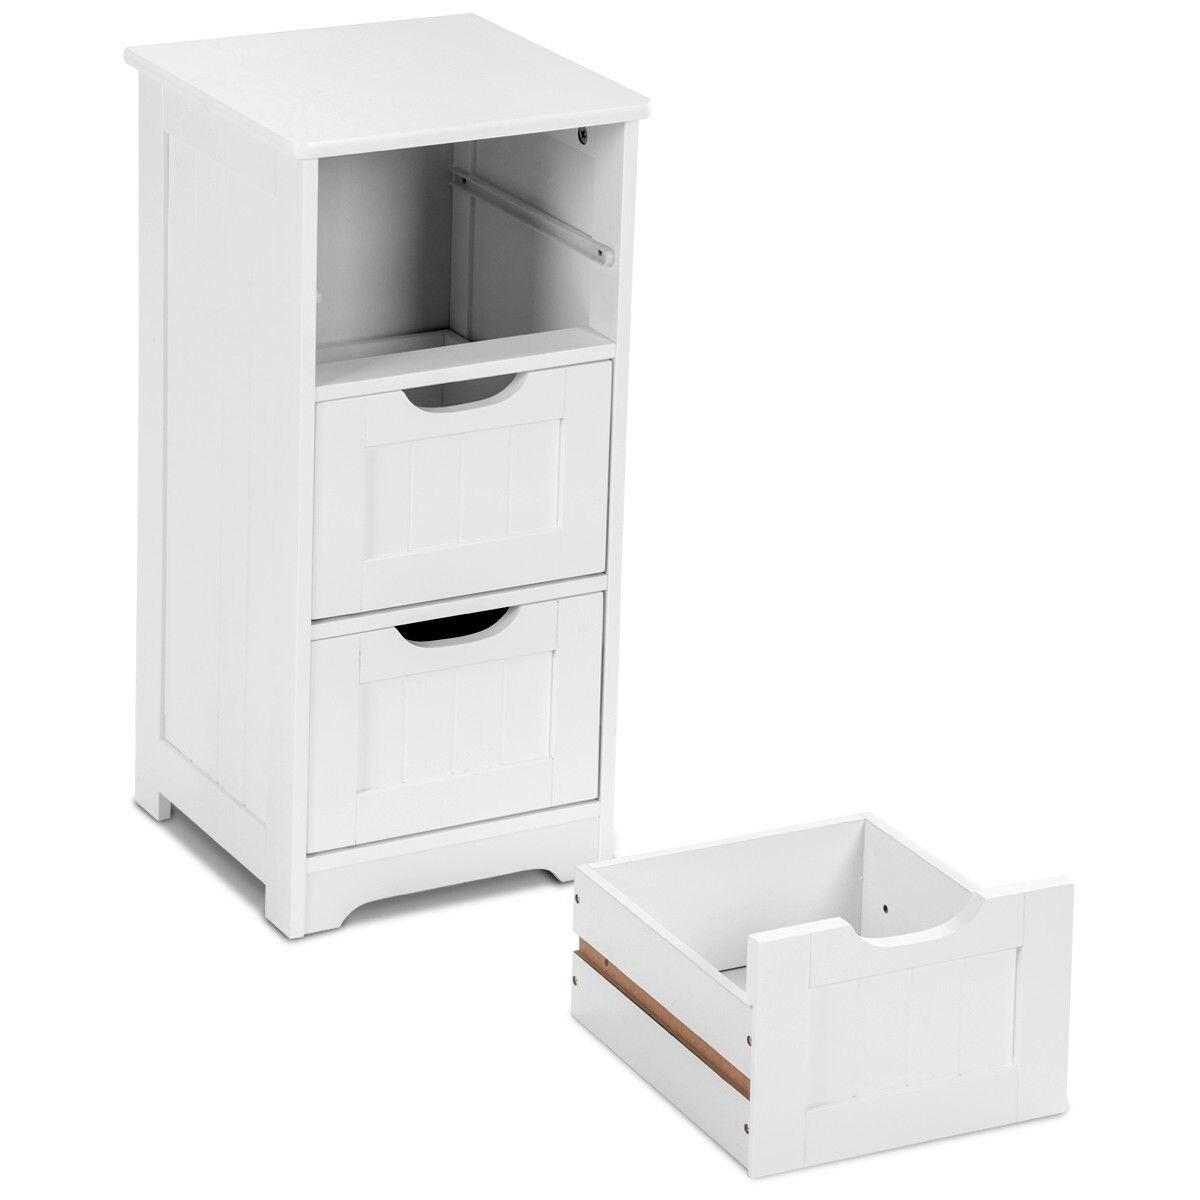 Shop Gymax Bathroom Floor Cabinet Wooden Free Standing Storage Side ...